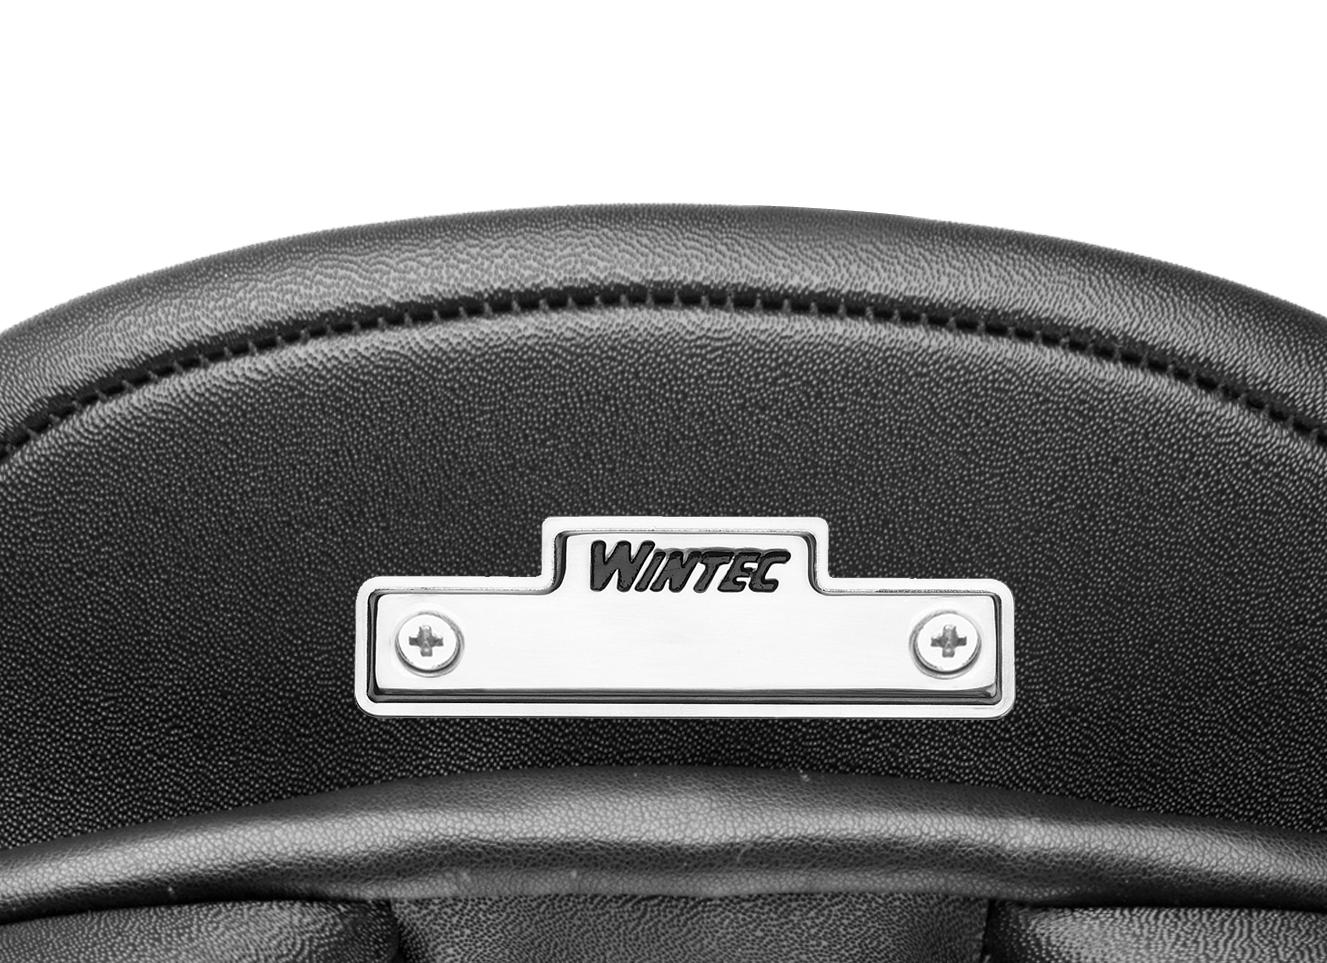 Wintec Name Plate